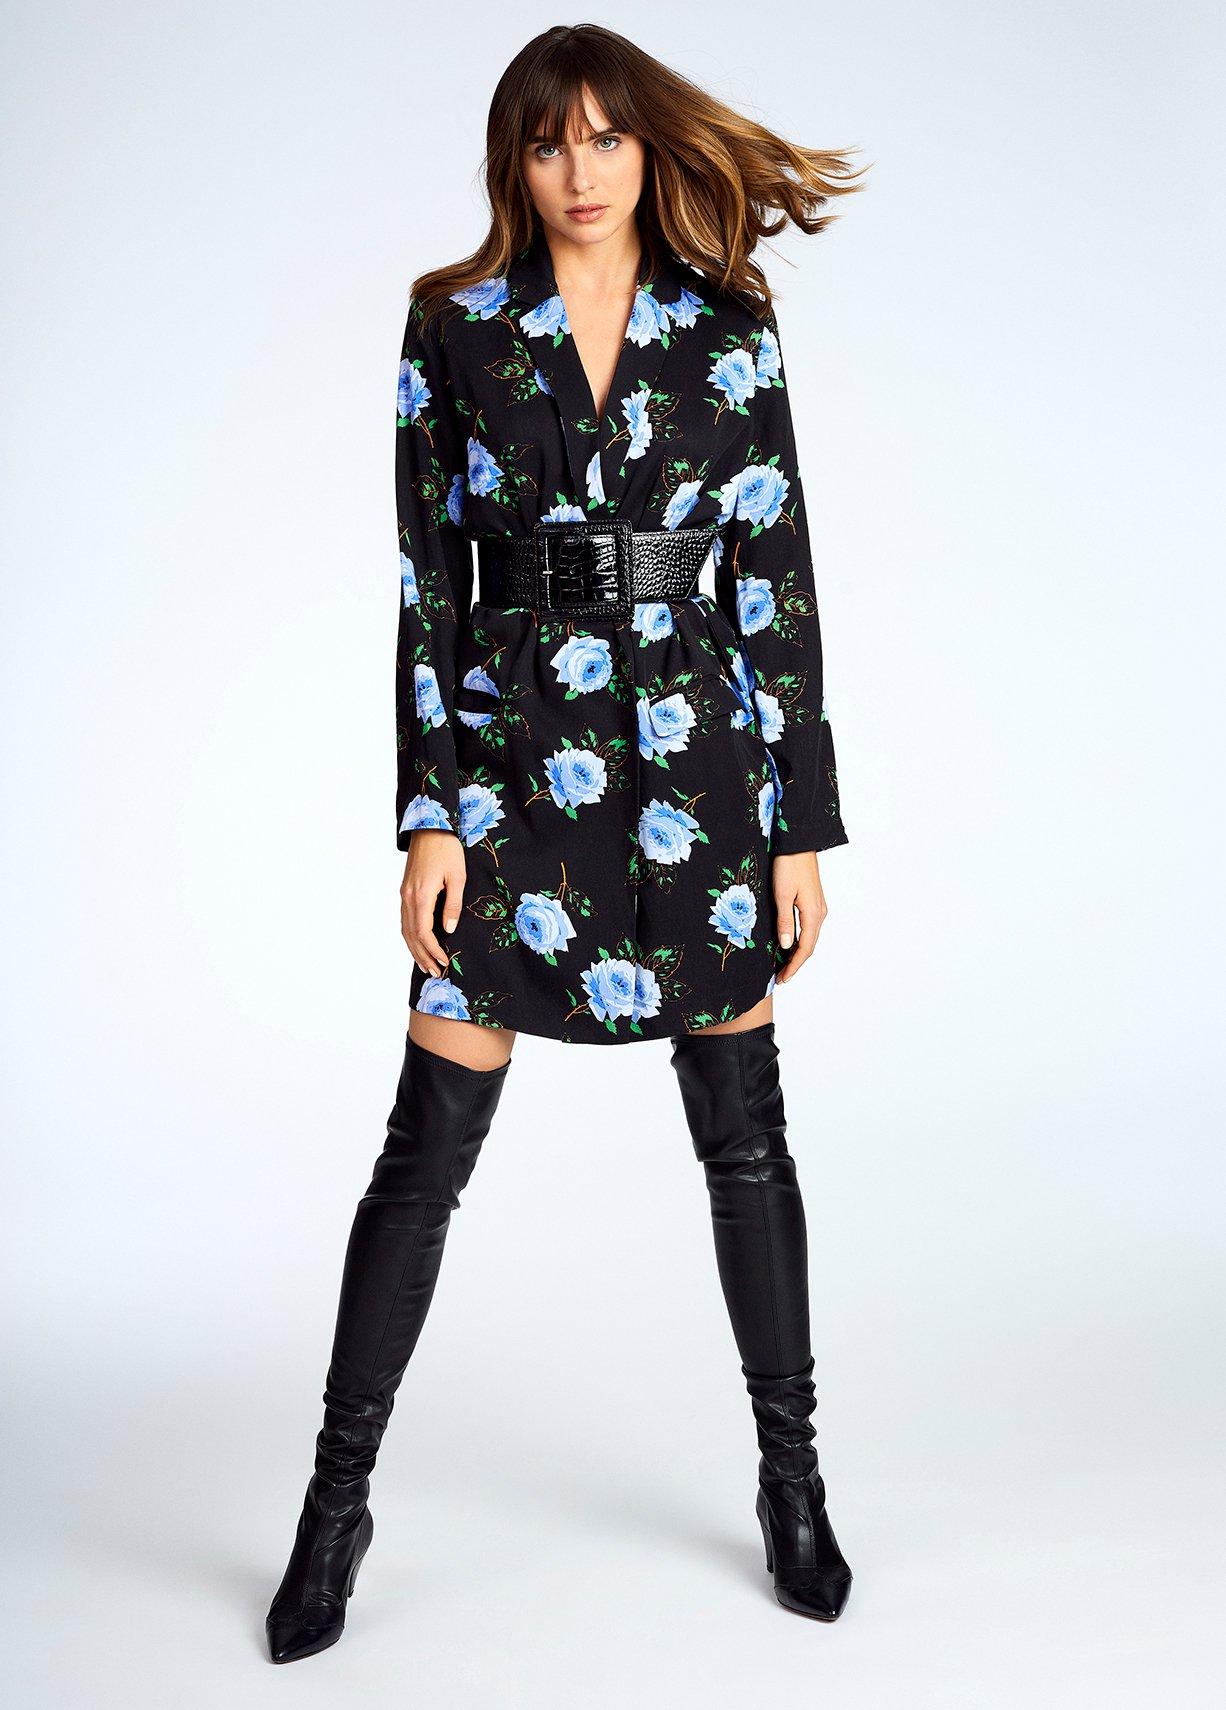 Jane-Young-Essentiel-Antwerp-Blazer-Dress-Model